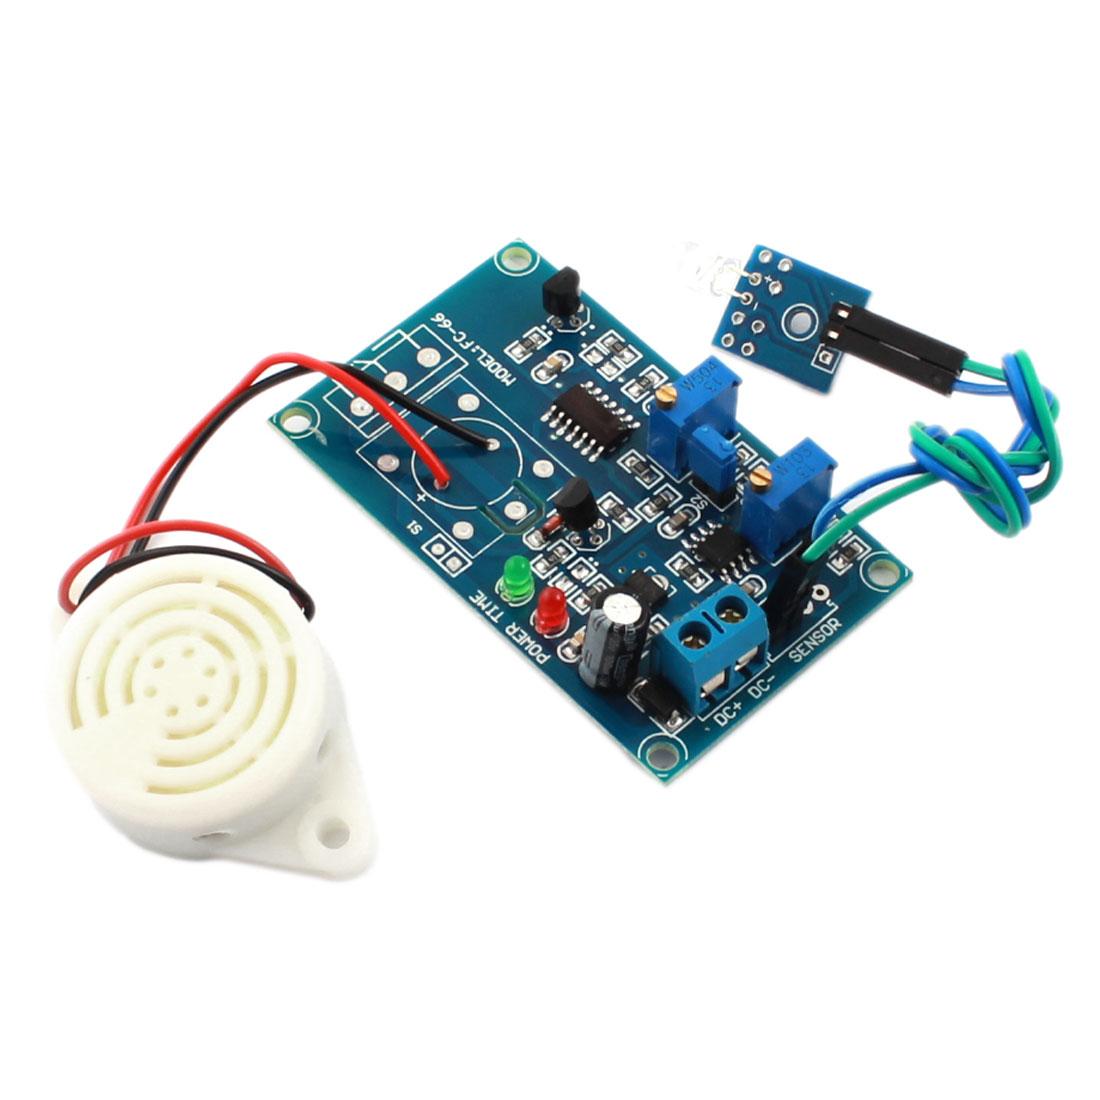 FC-66 DC24V Light Detection Photosensitive Diode Sensor Delay Alarm PCB Circuit Module w Piezo Buzzer